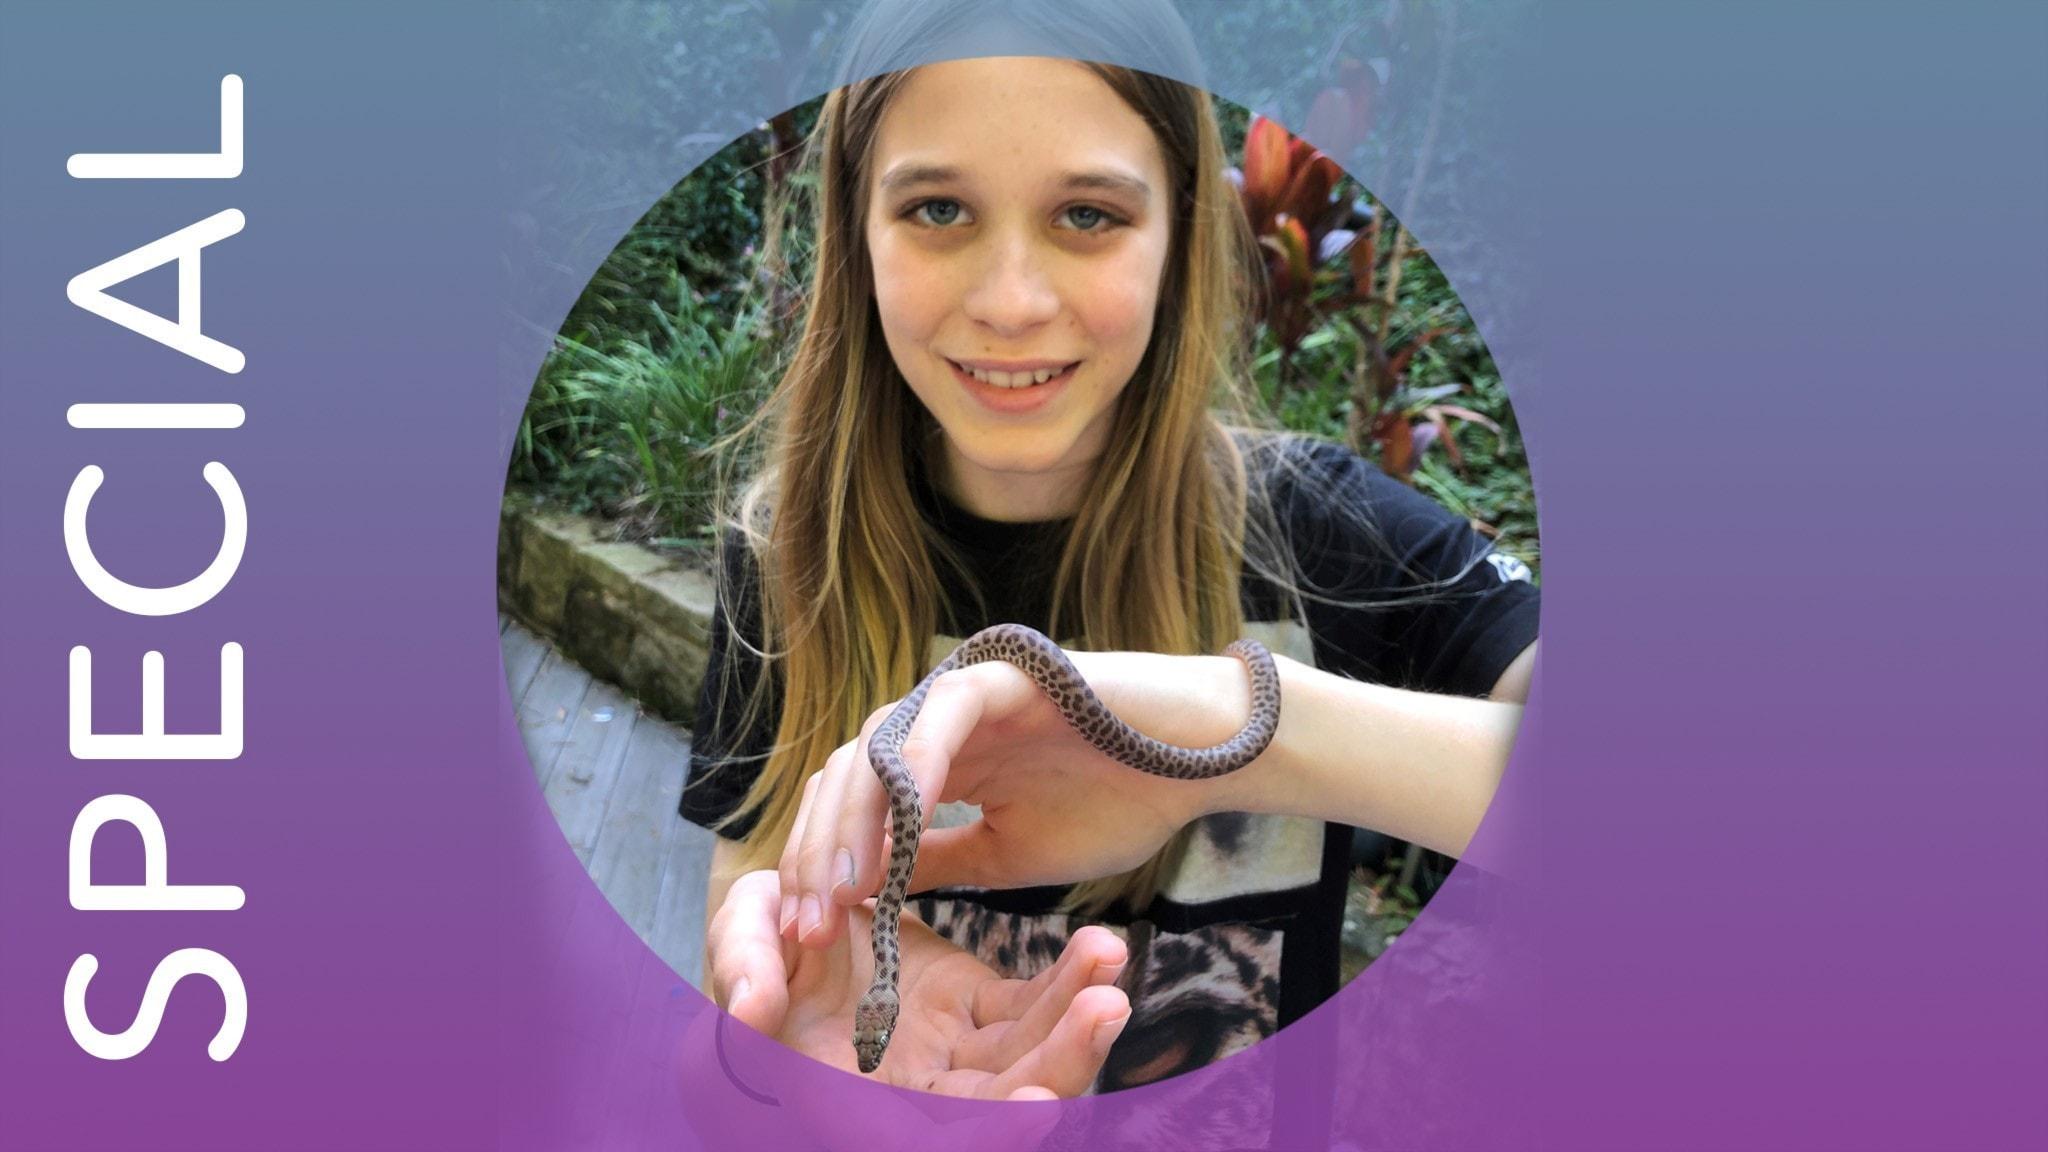 Oliver Klineberg i Australien med sin orm.